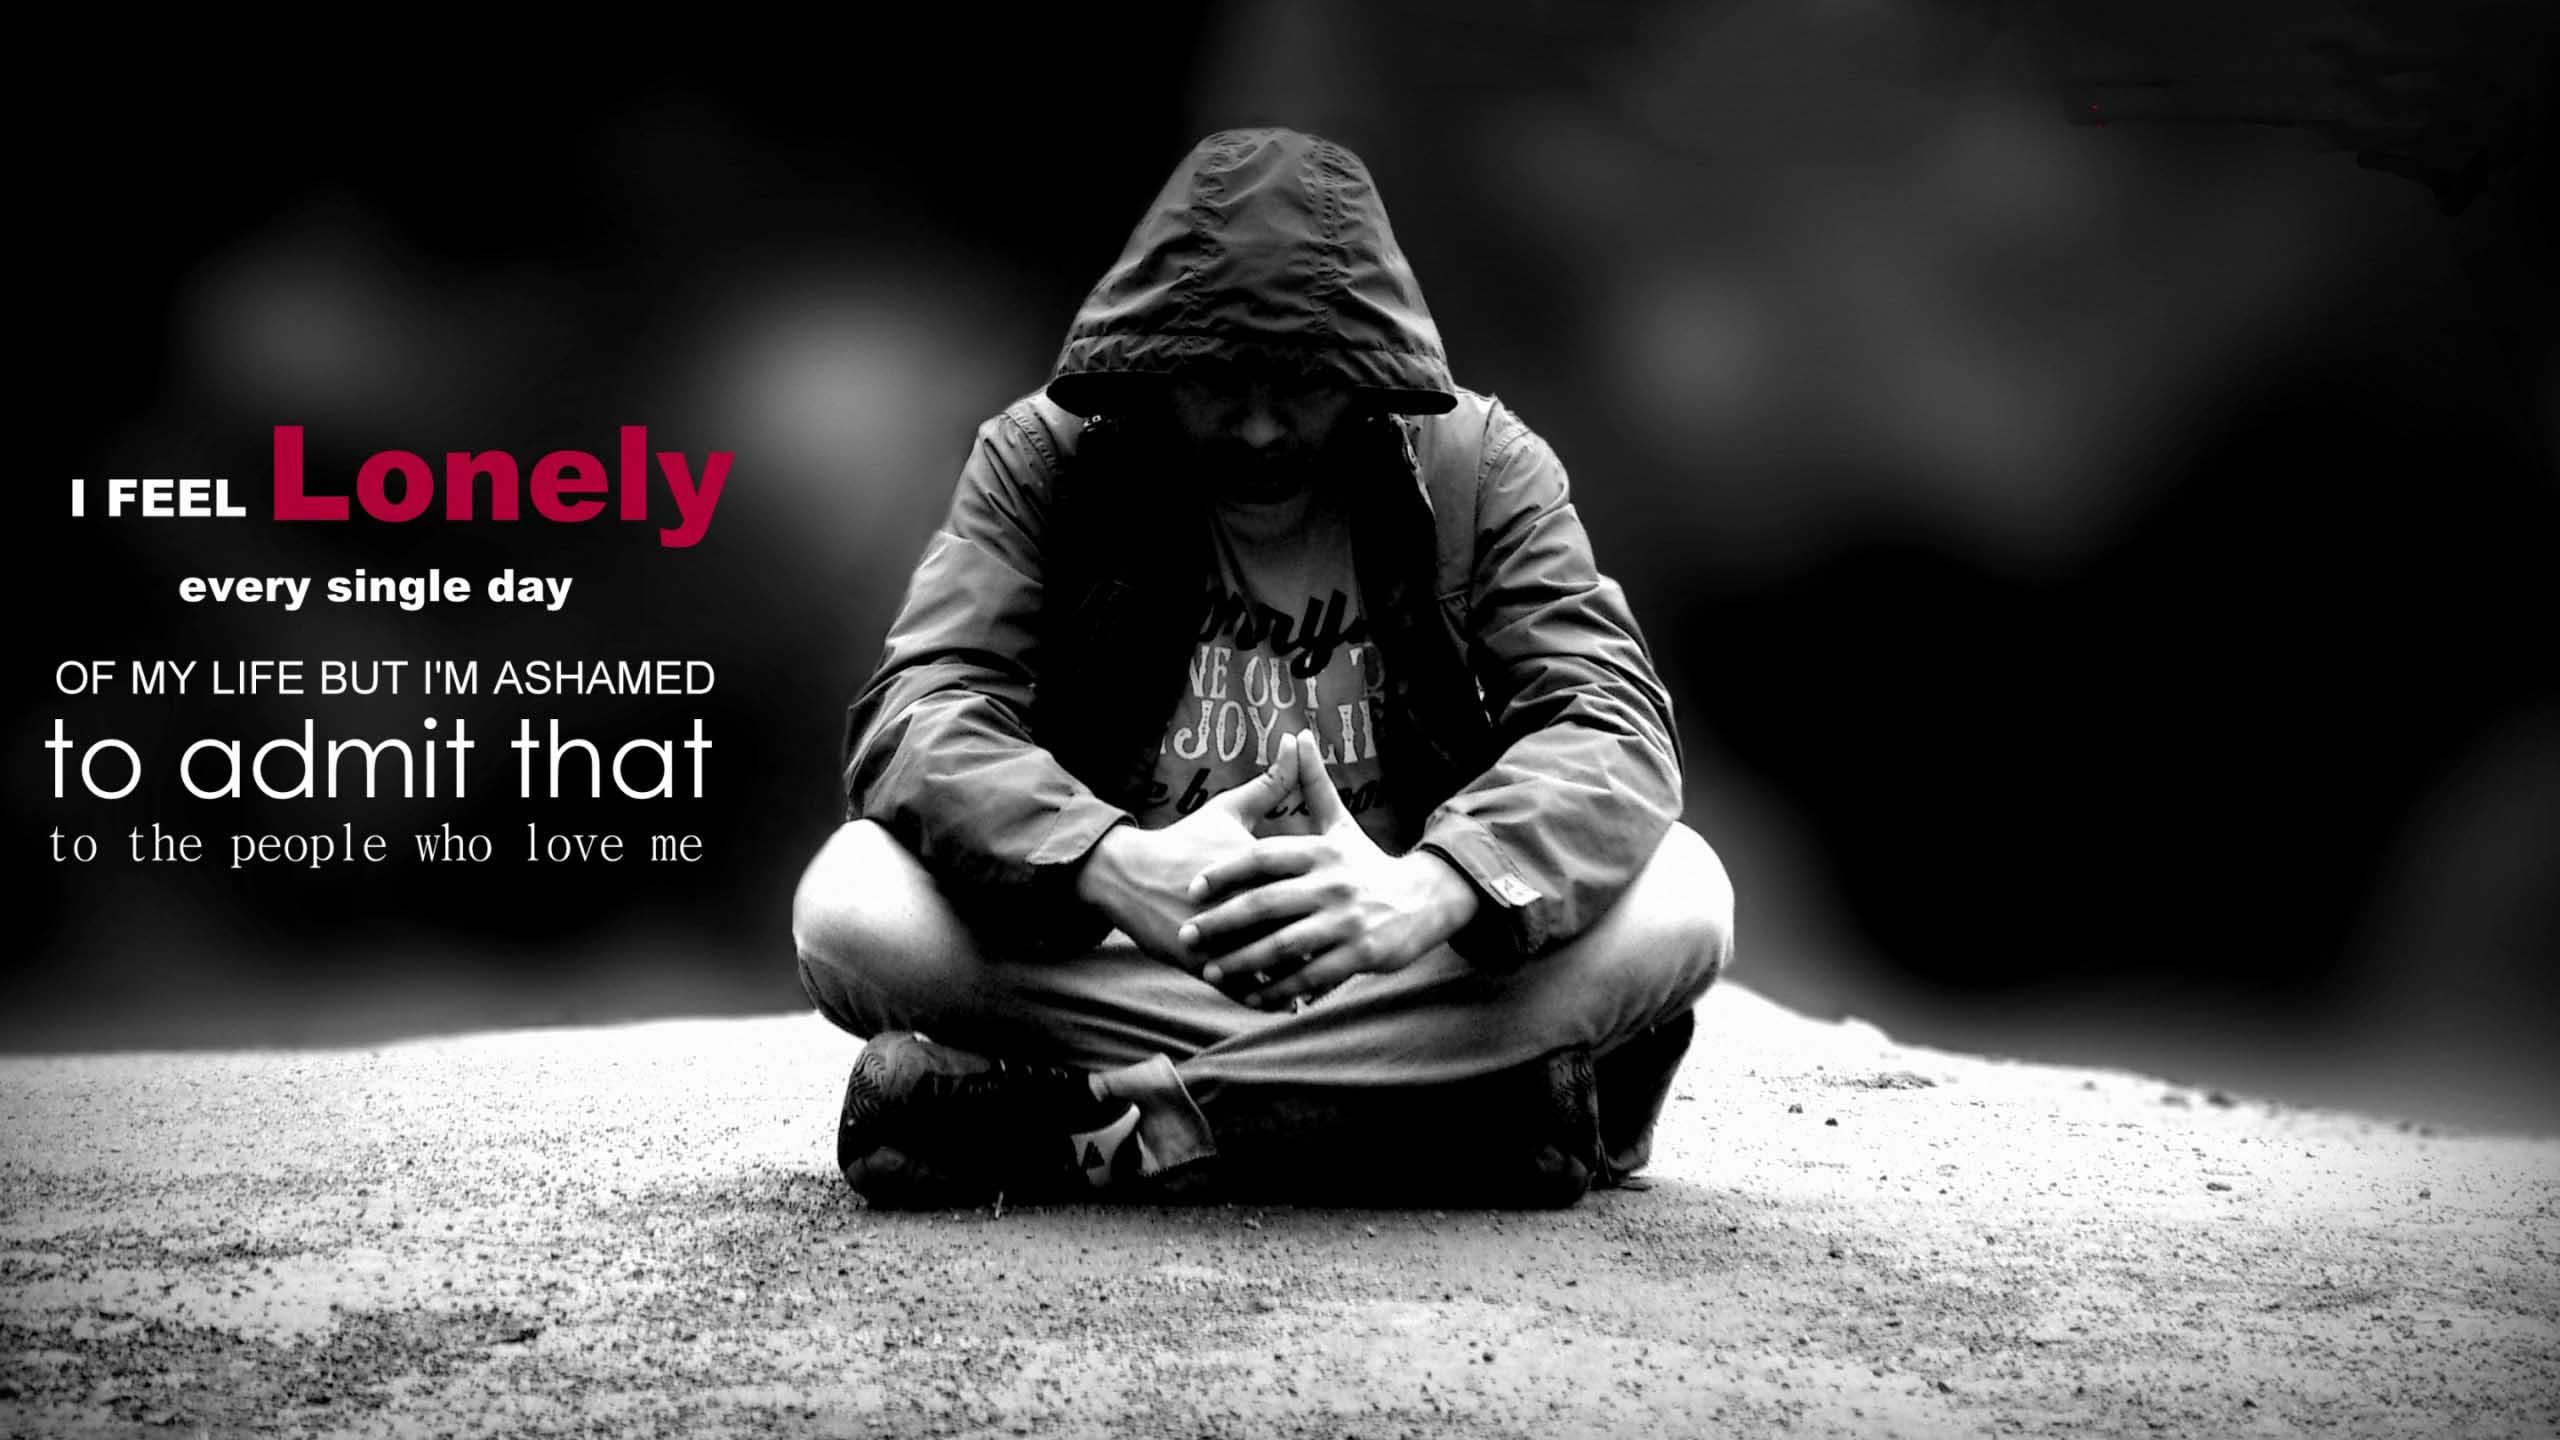 Heart Touching Sad Boy Wallpaper Alone Boy Sad Images 2560x1440